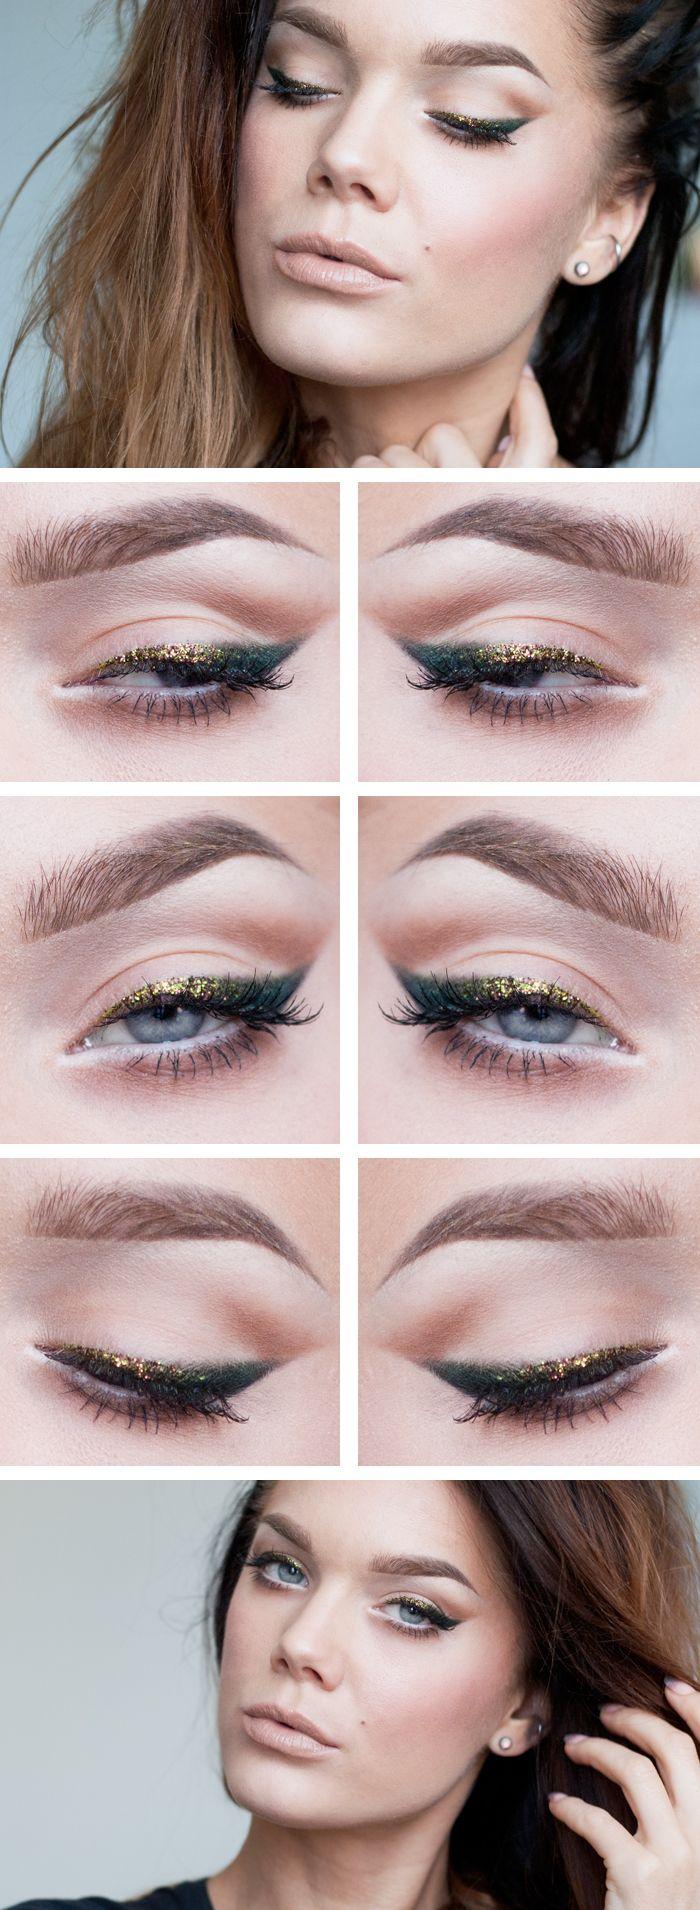 "Today's Look : ""Glitter Liner"" -Linda Hallberg (09/15/13)"